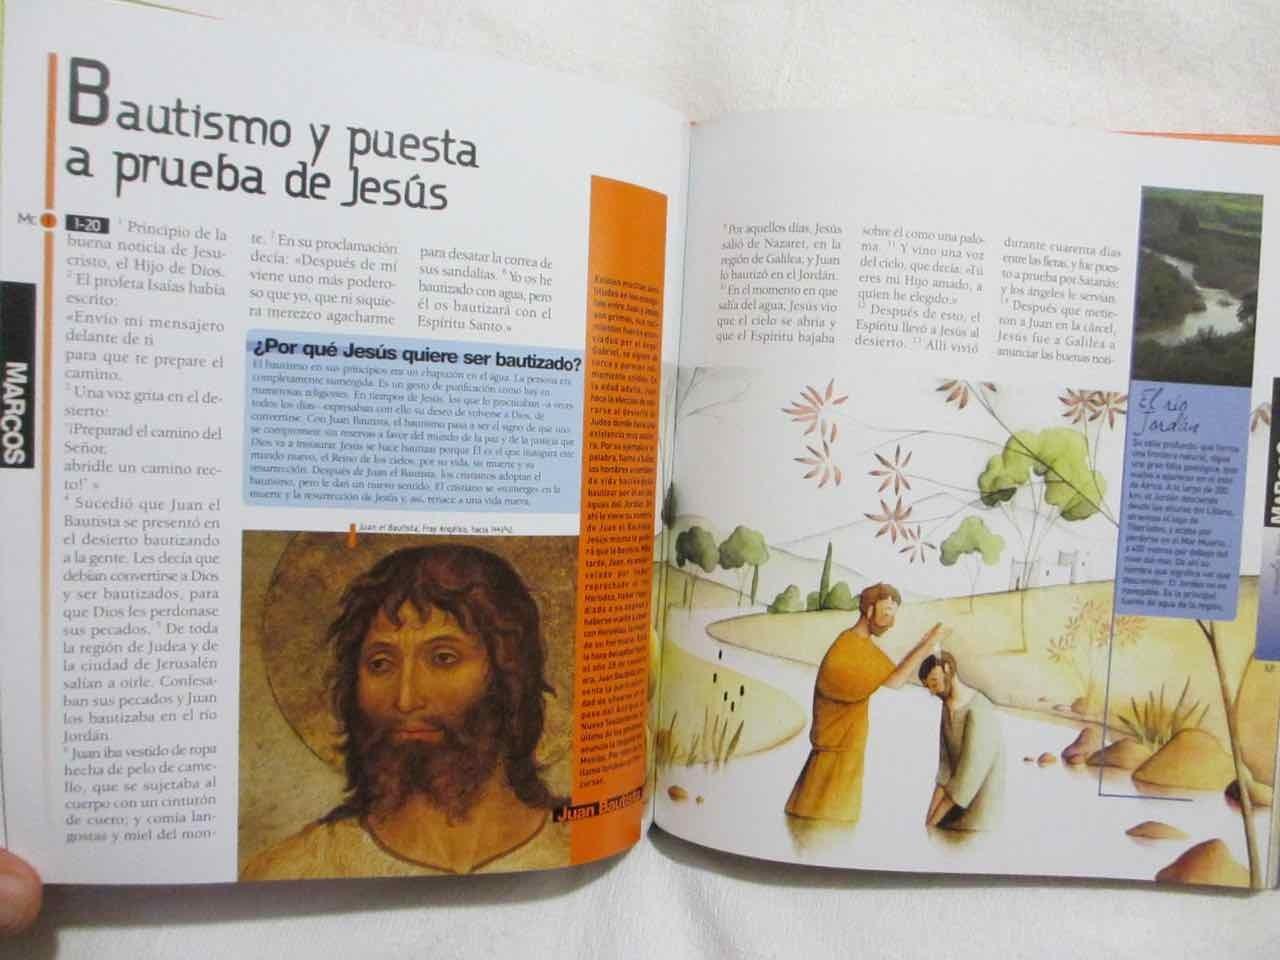 Biblia Biblia Bíblico Tanak Bíblico Jovenproyecto Jovenproyecto Biblia Tanak Jovenproyecto SMGUqzpV